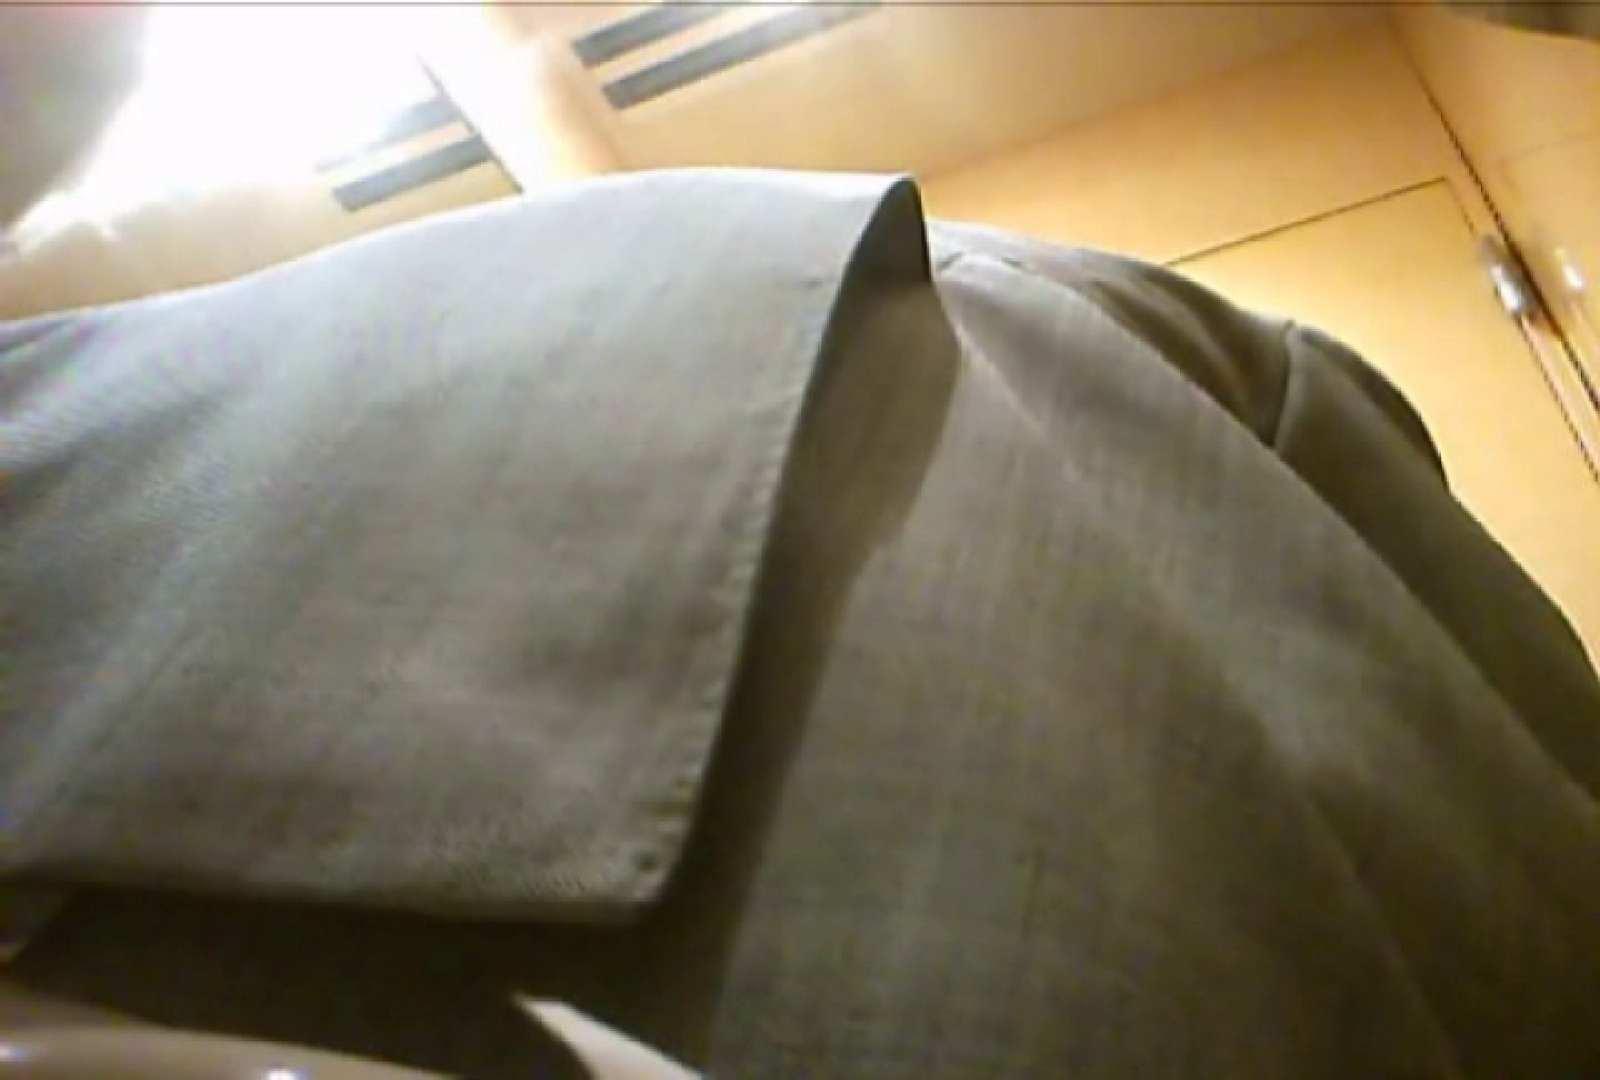 SEASON 2ND!掴み取りさんの洗面所覗き!in新幹線!VOL.02 スーツボーイズ | ノンケボーイズ  82pic 28